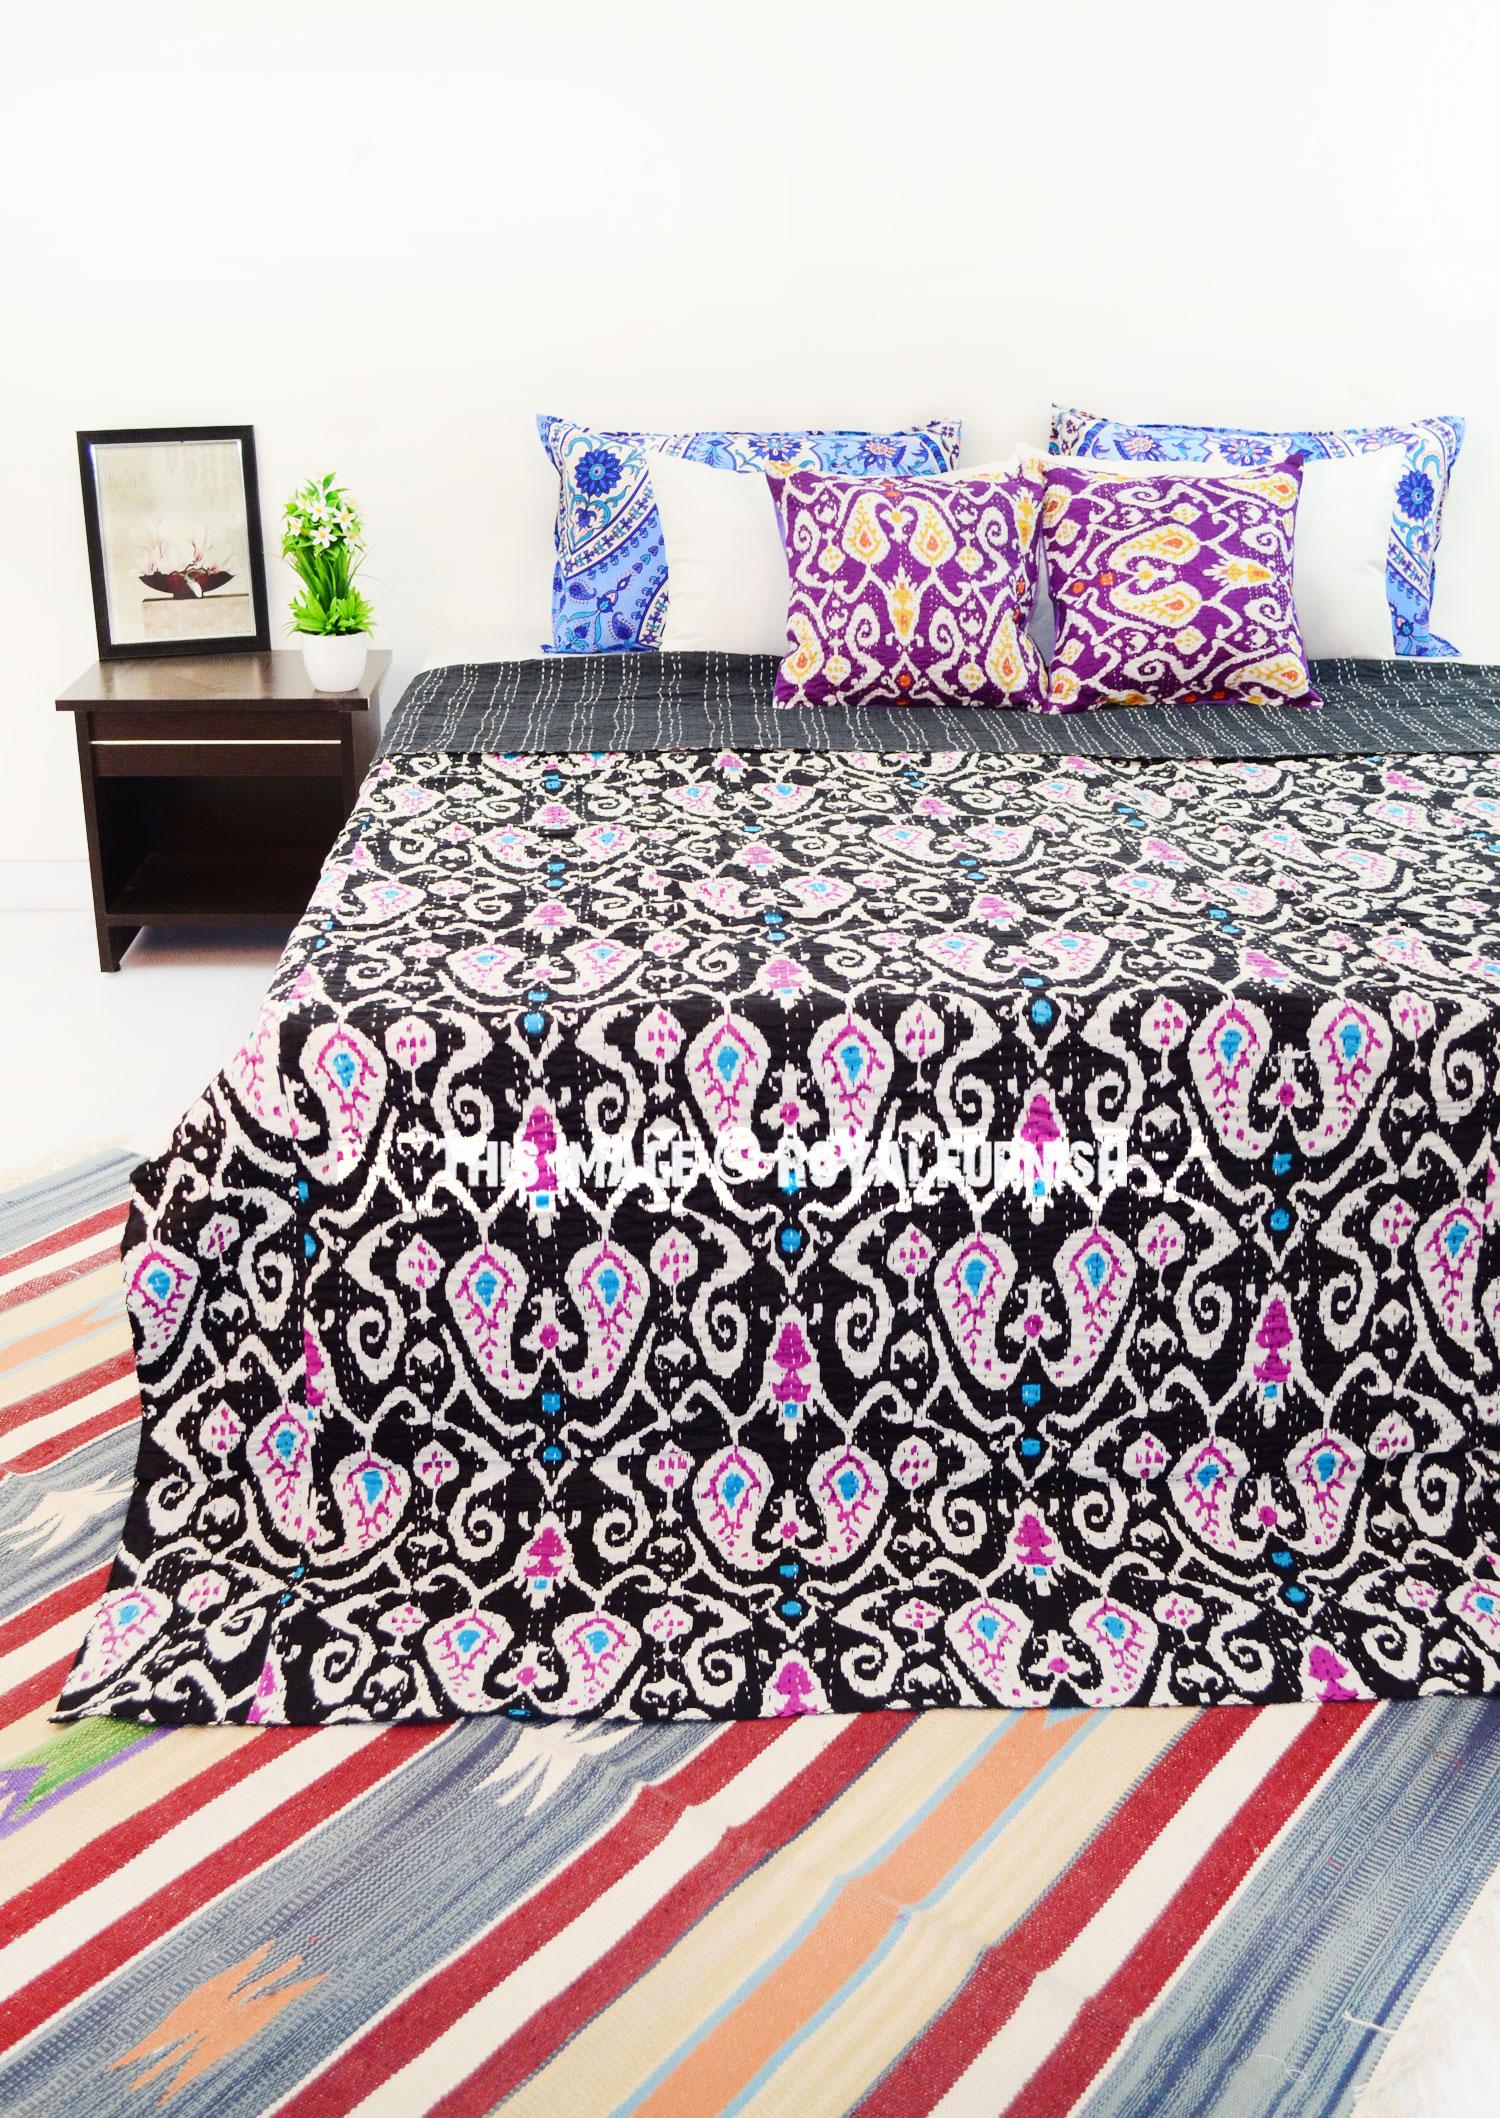 Black Queen Size Paisley Ikat Kantha Quilt Blanket Bedding